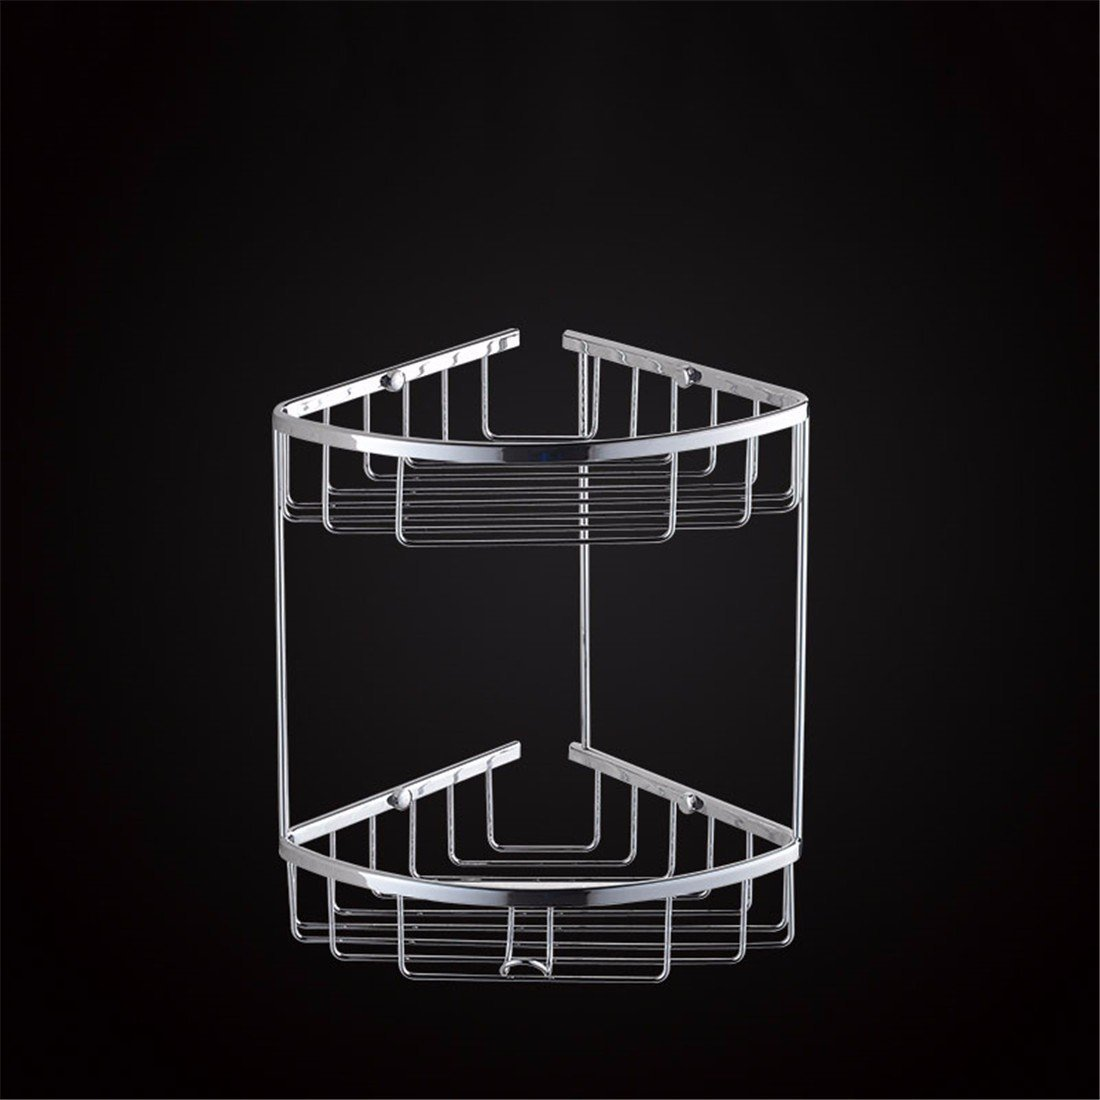 LAONA A contemporary minimalist Brass chrome bathroom accessory kit towel rack racks, built-in basket 2